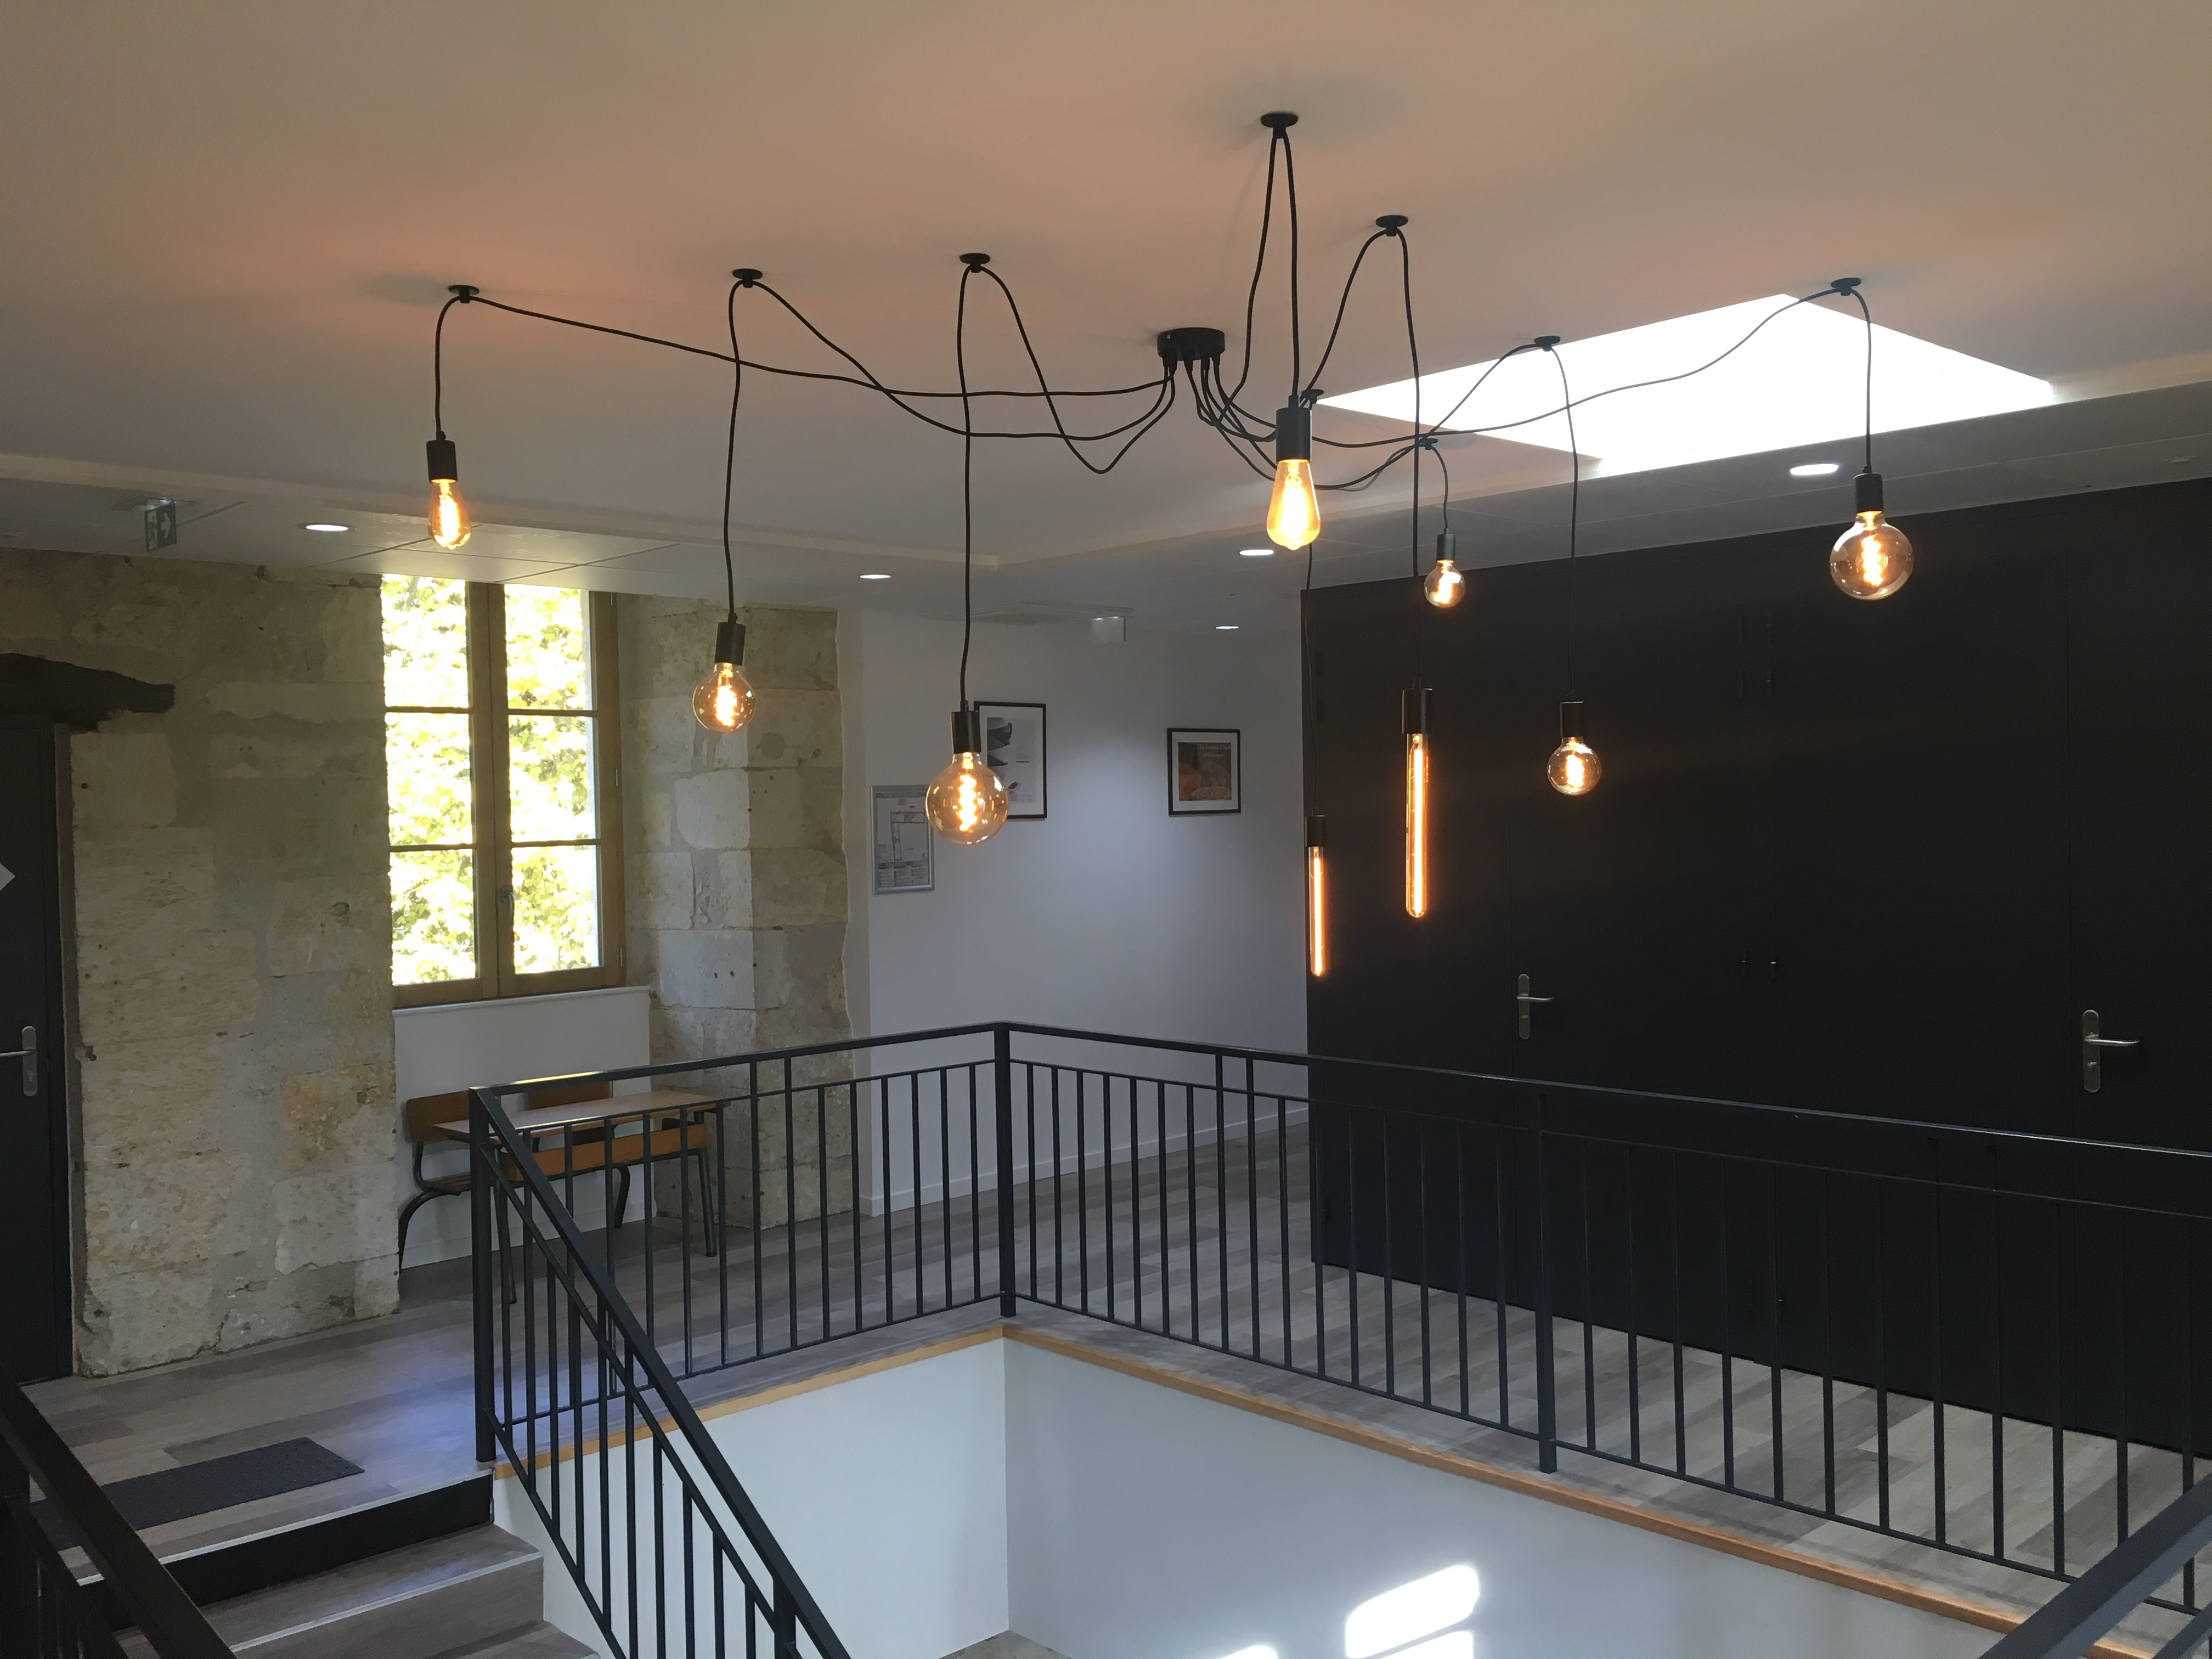 Escalier principal lumières (6)